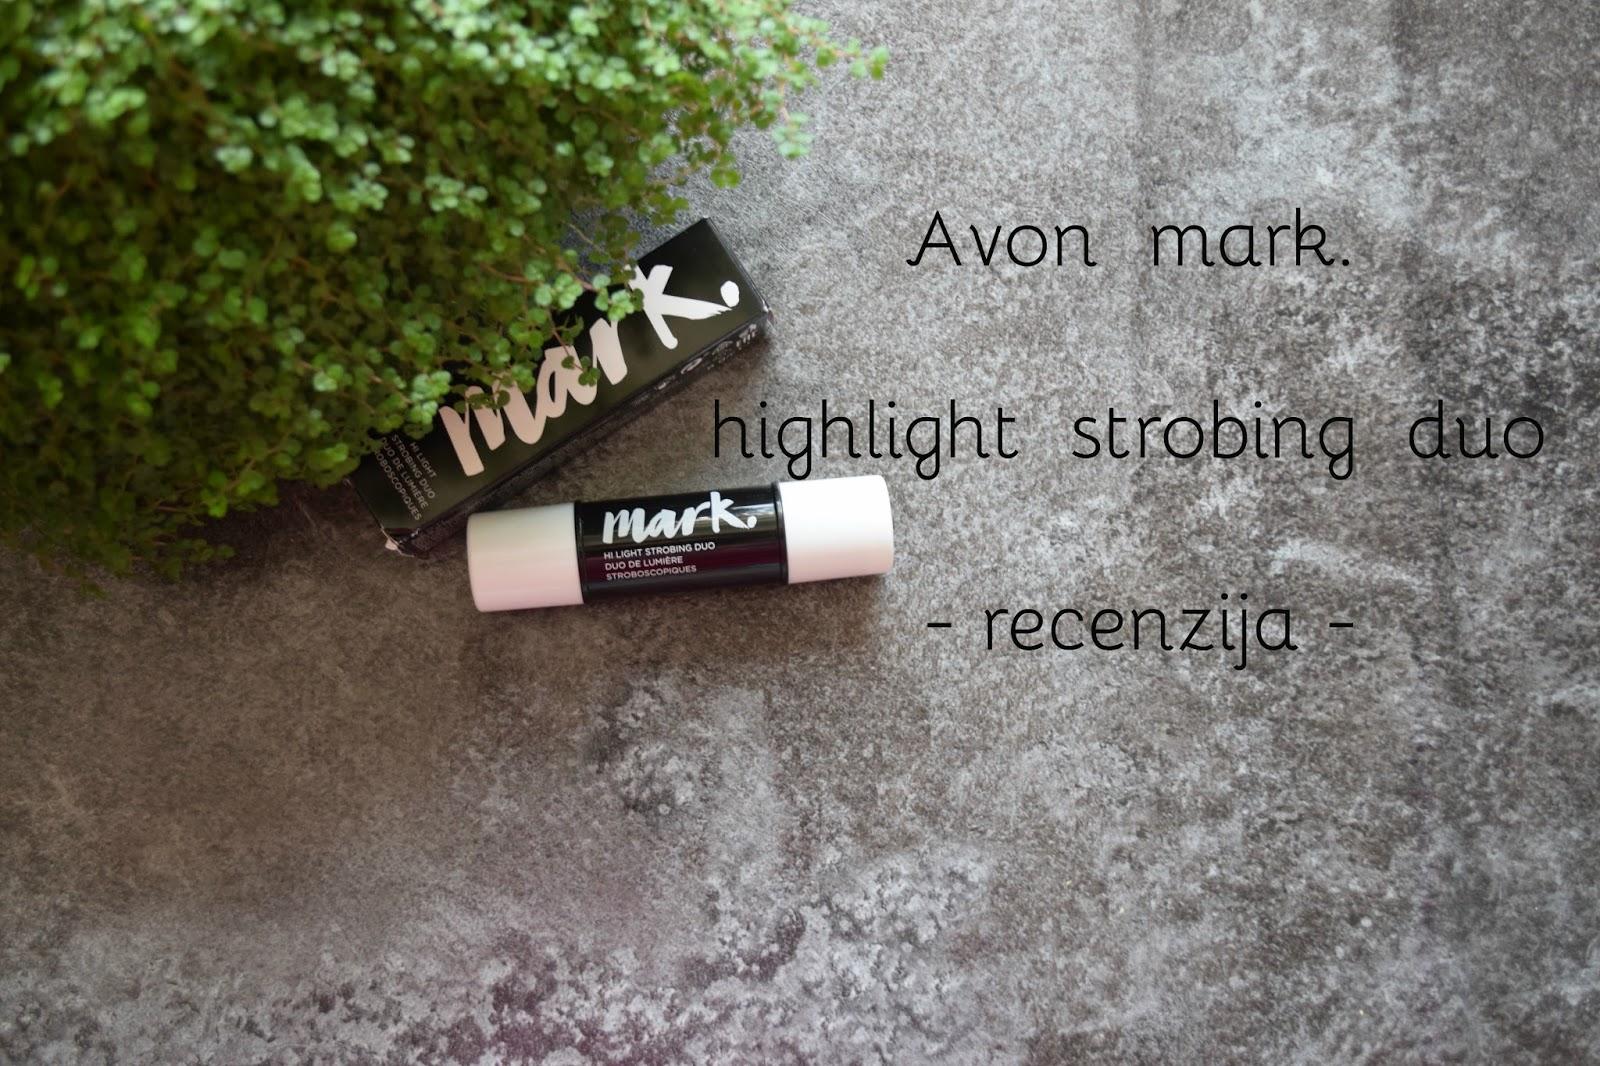 Avon mark strobing duo recenzija